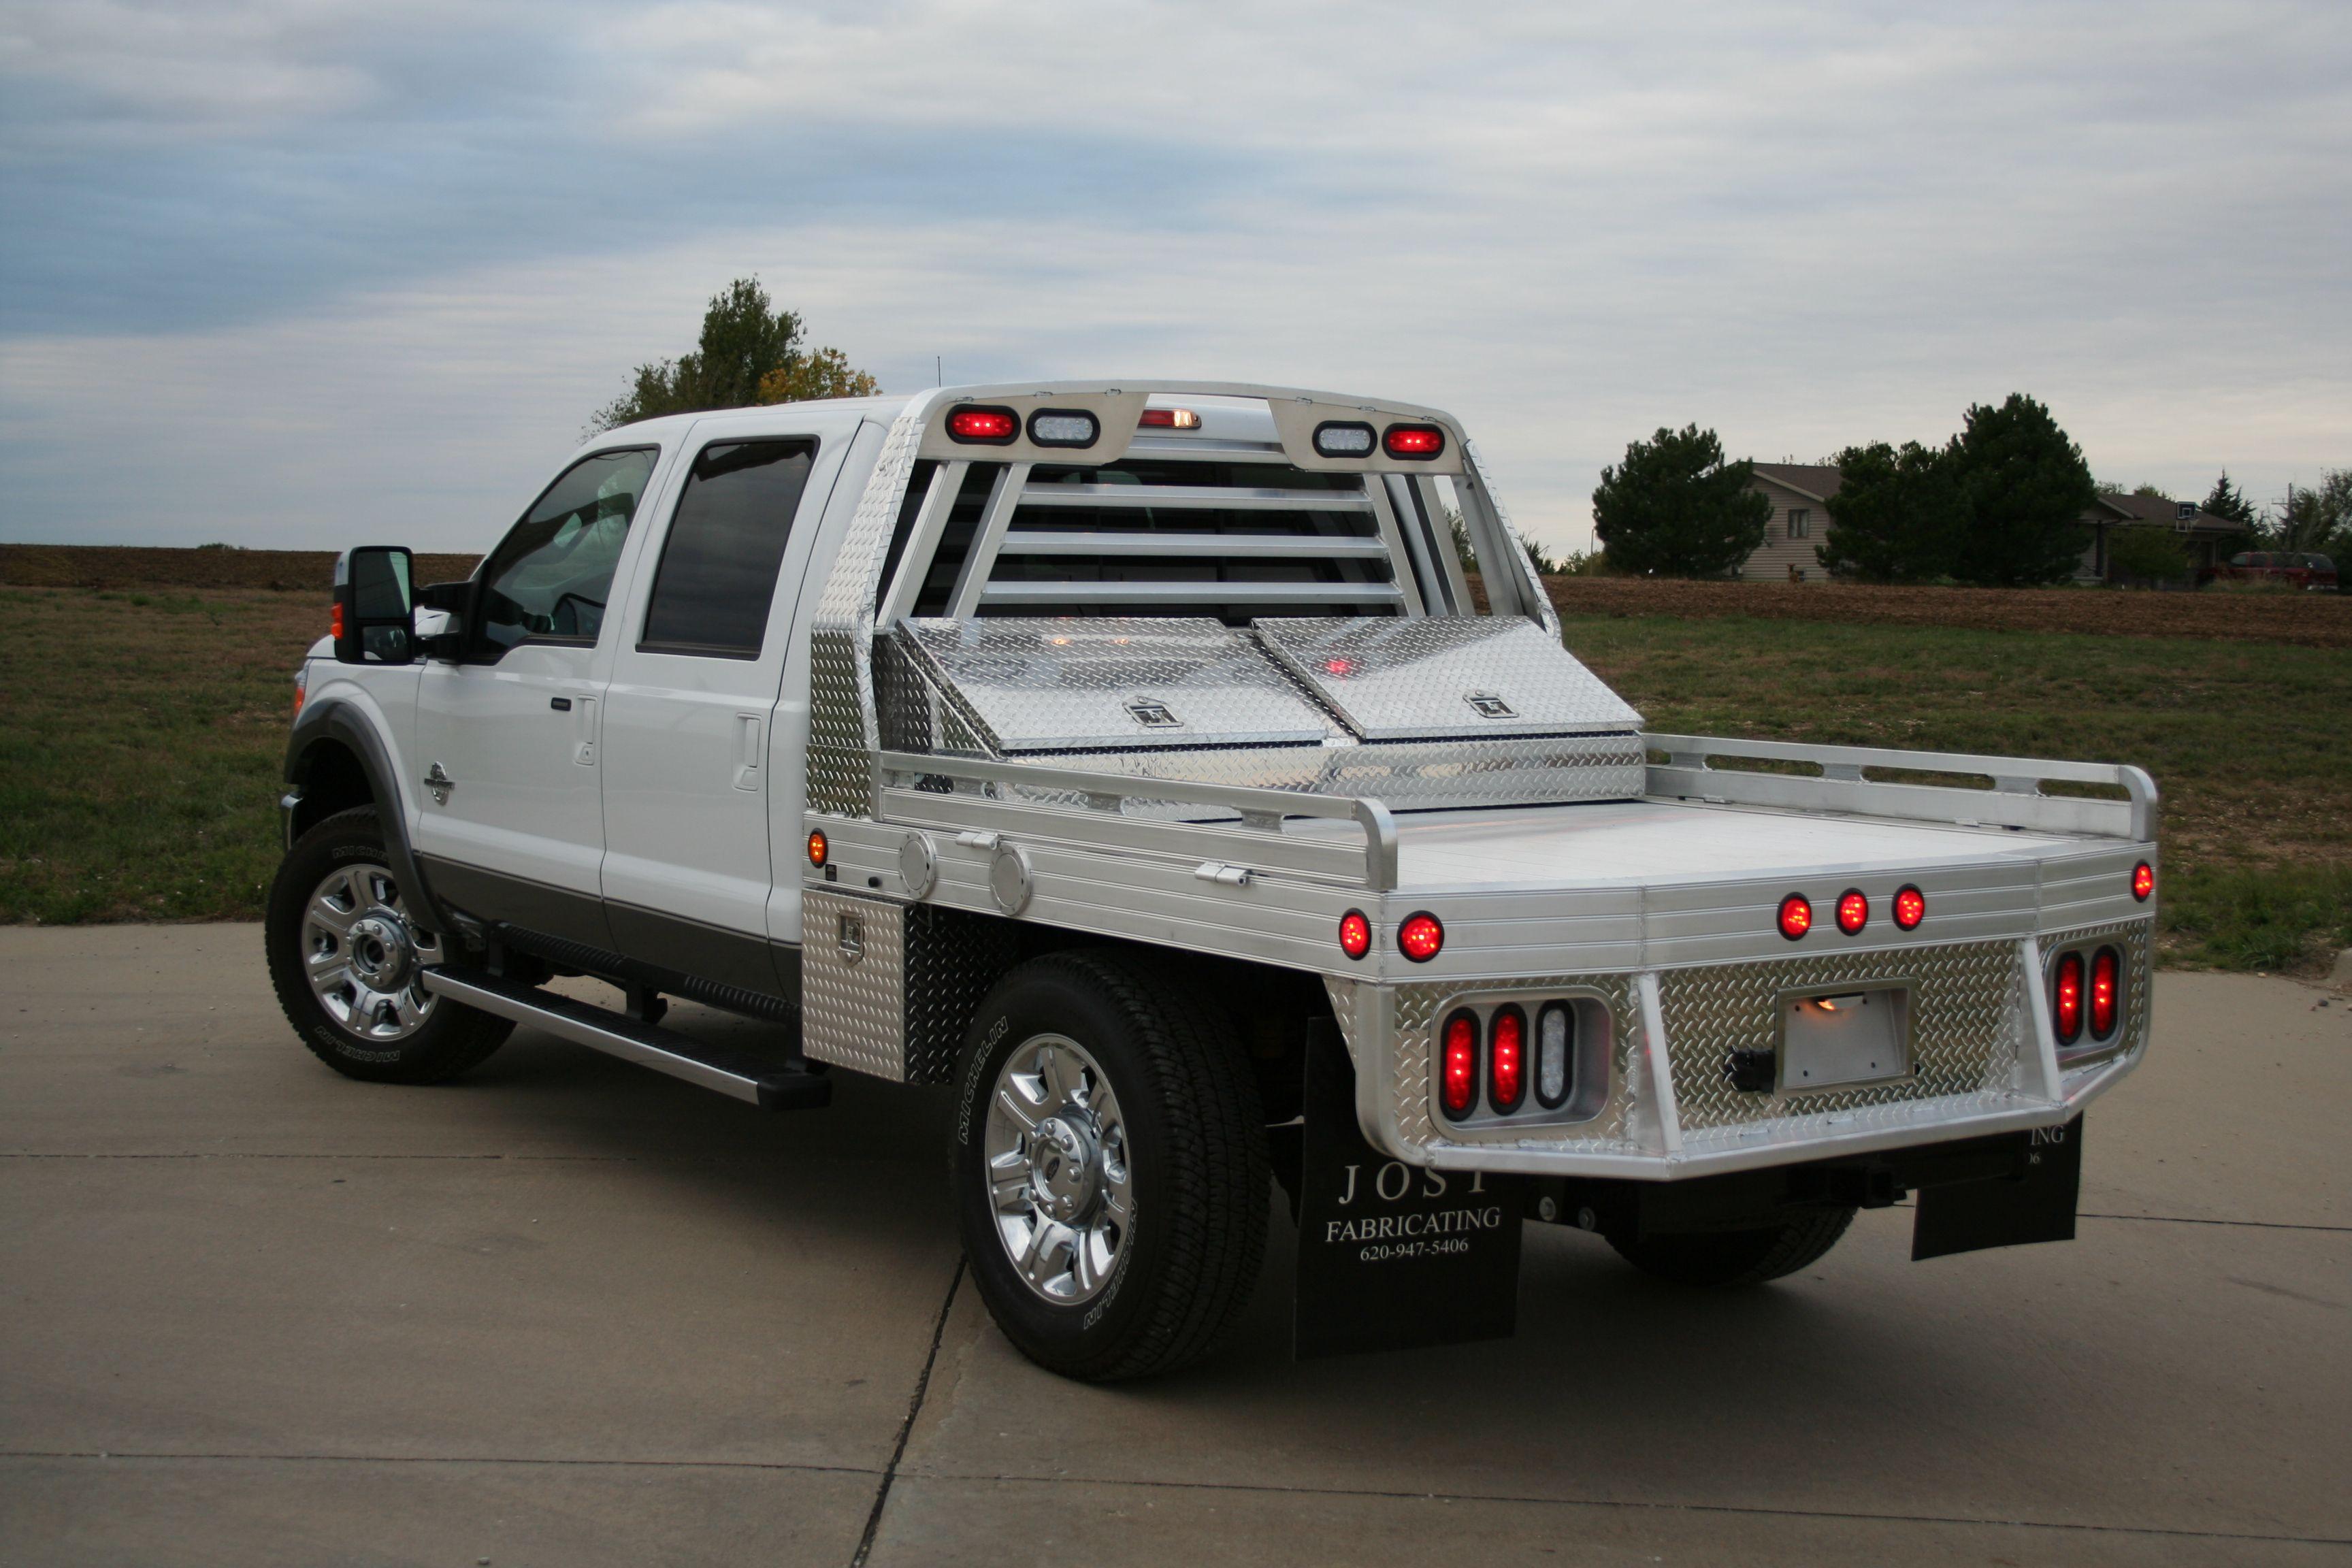 3000 Series Aluminum Truck Beds Hillsboro Trailers And Truckbeds